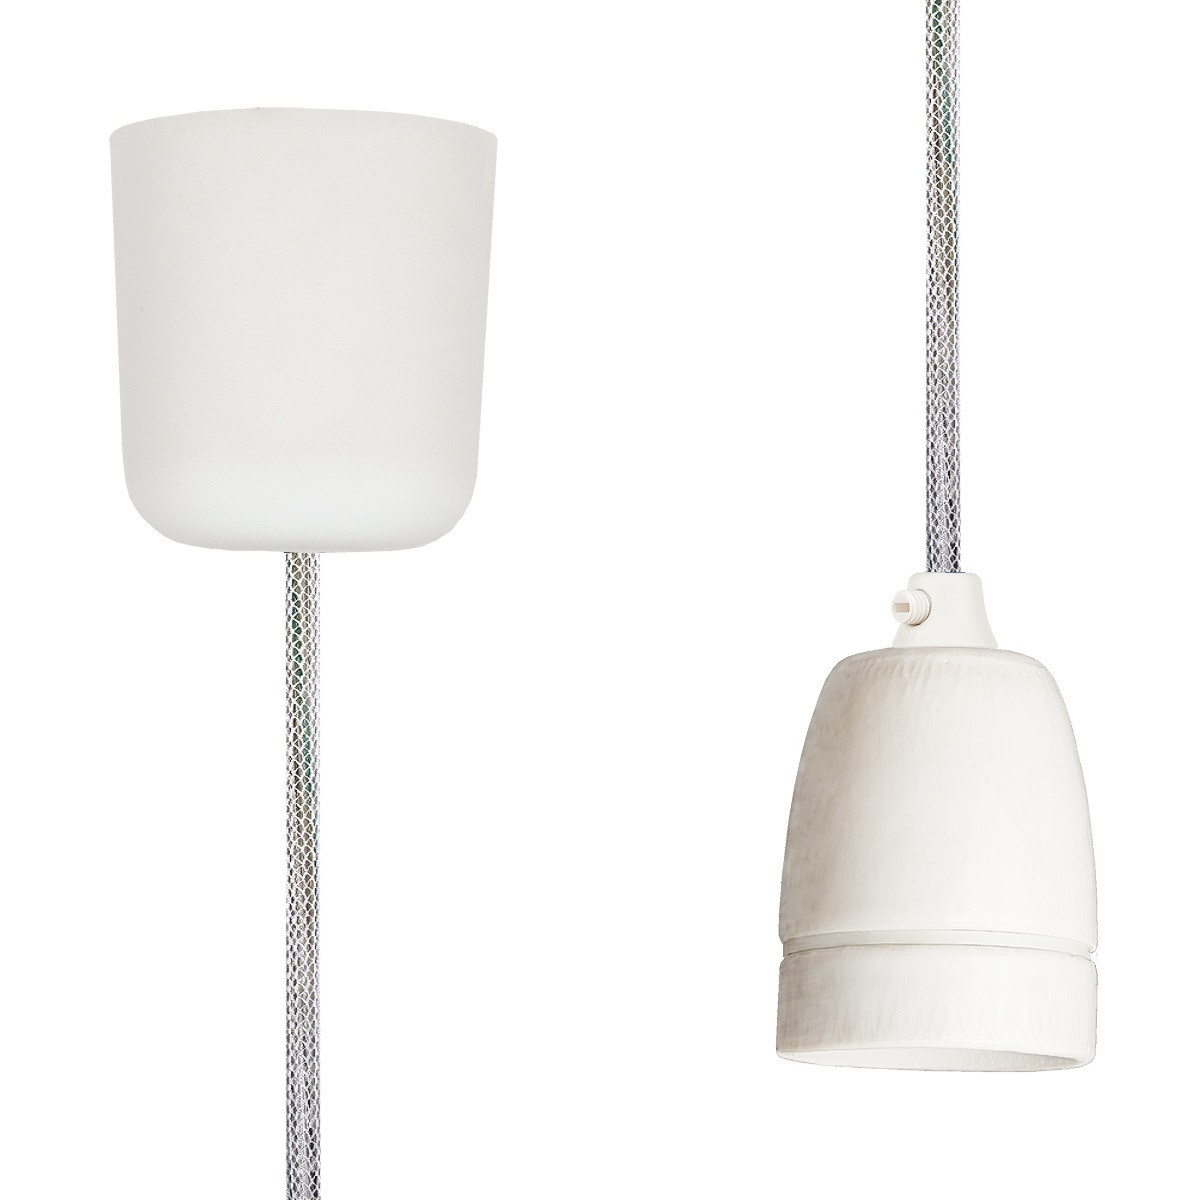 Pendant Lamp Porcelain Shiny White Netlike